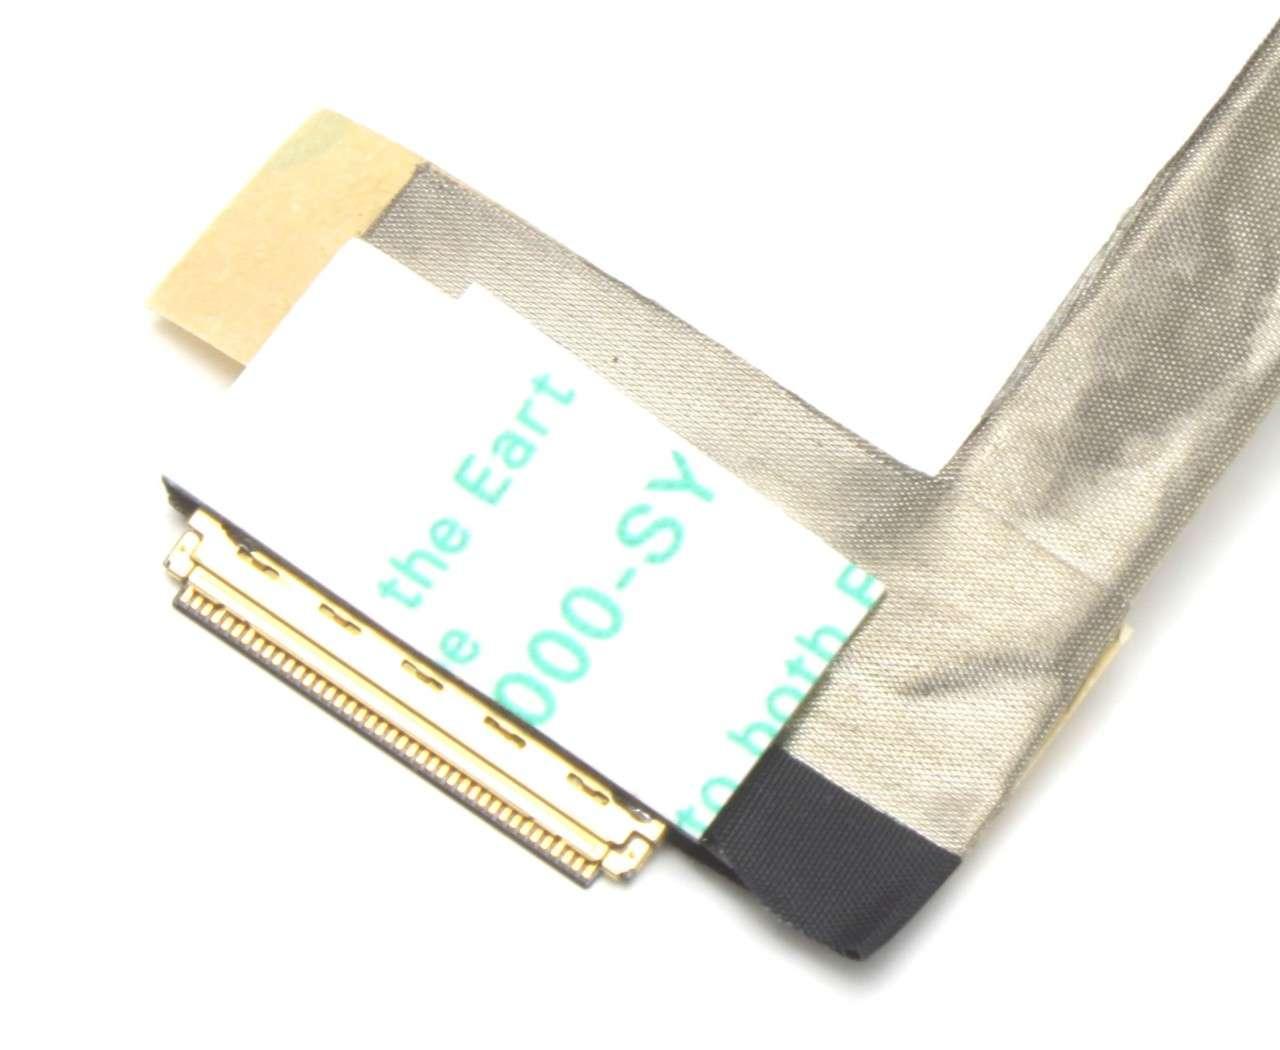 Cablu video LVDS Toshiba DC02001A110 LED imagine powerlaptop.ro 2021